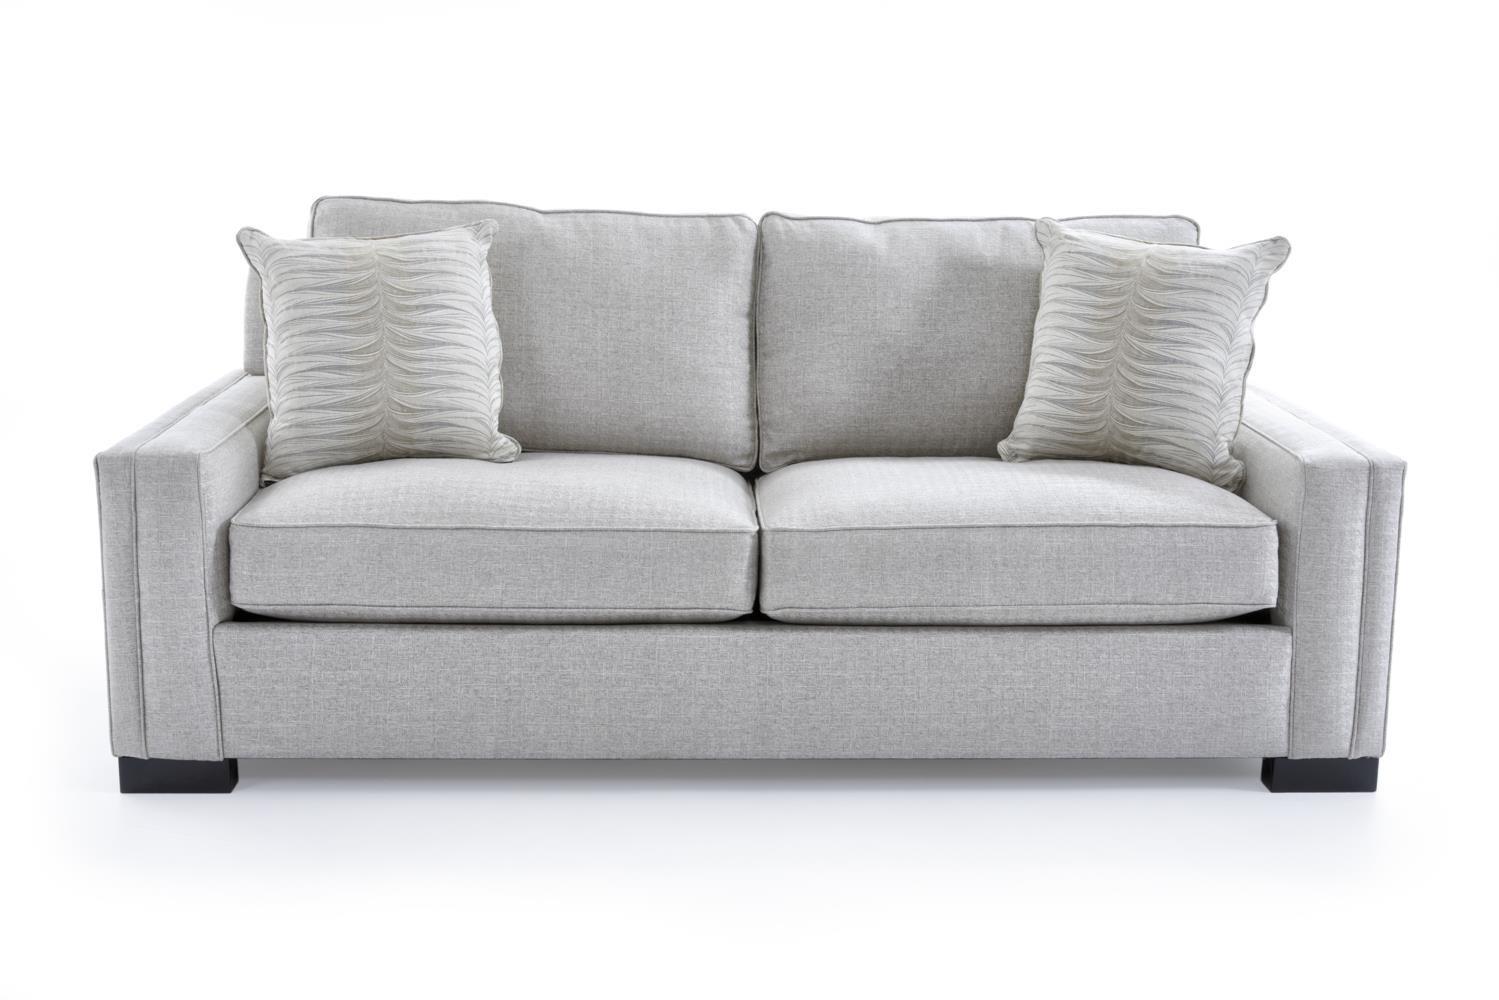 broyhill laramie sofa fabric good designs fabrics sofas and sectionals thesofa